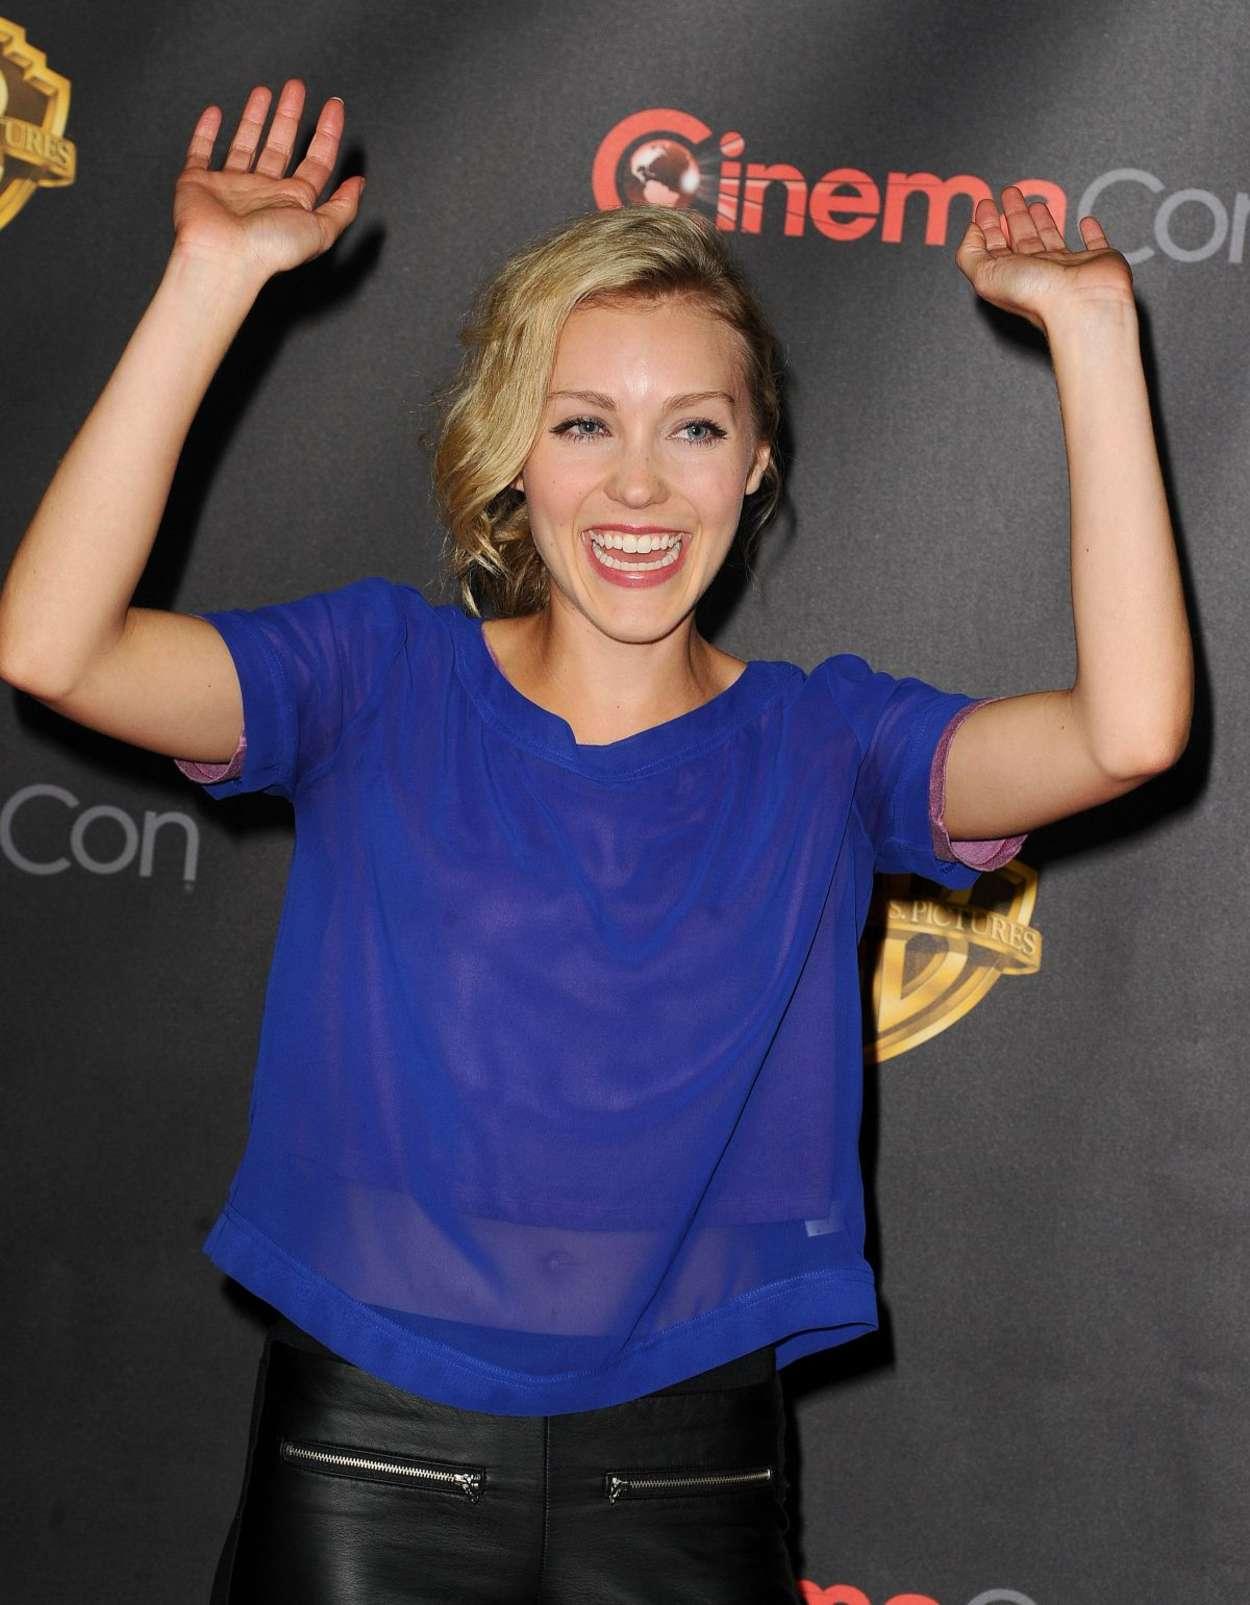 ... Breanne Parhiala: WB 2015 Cinemacon Press Line -08 - Full Size ...